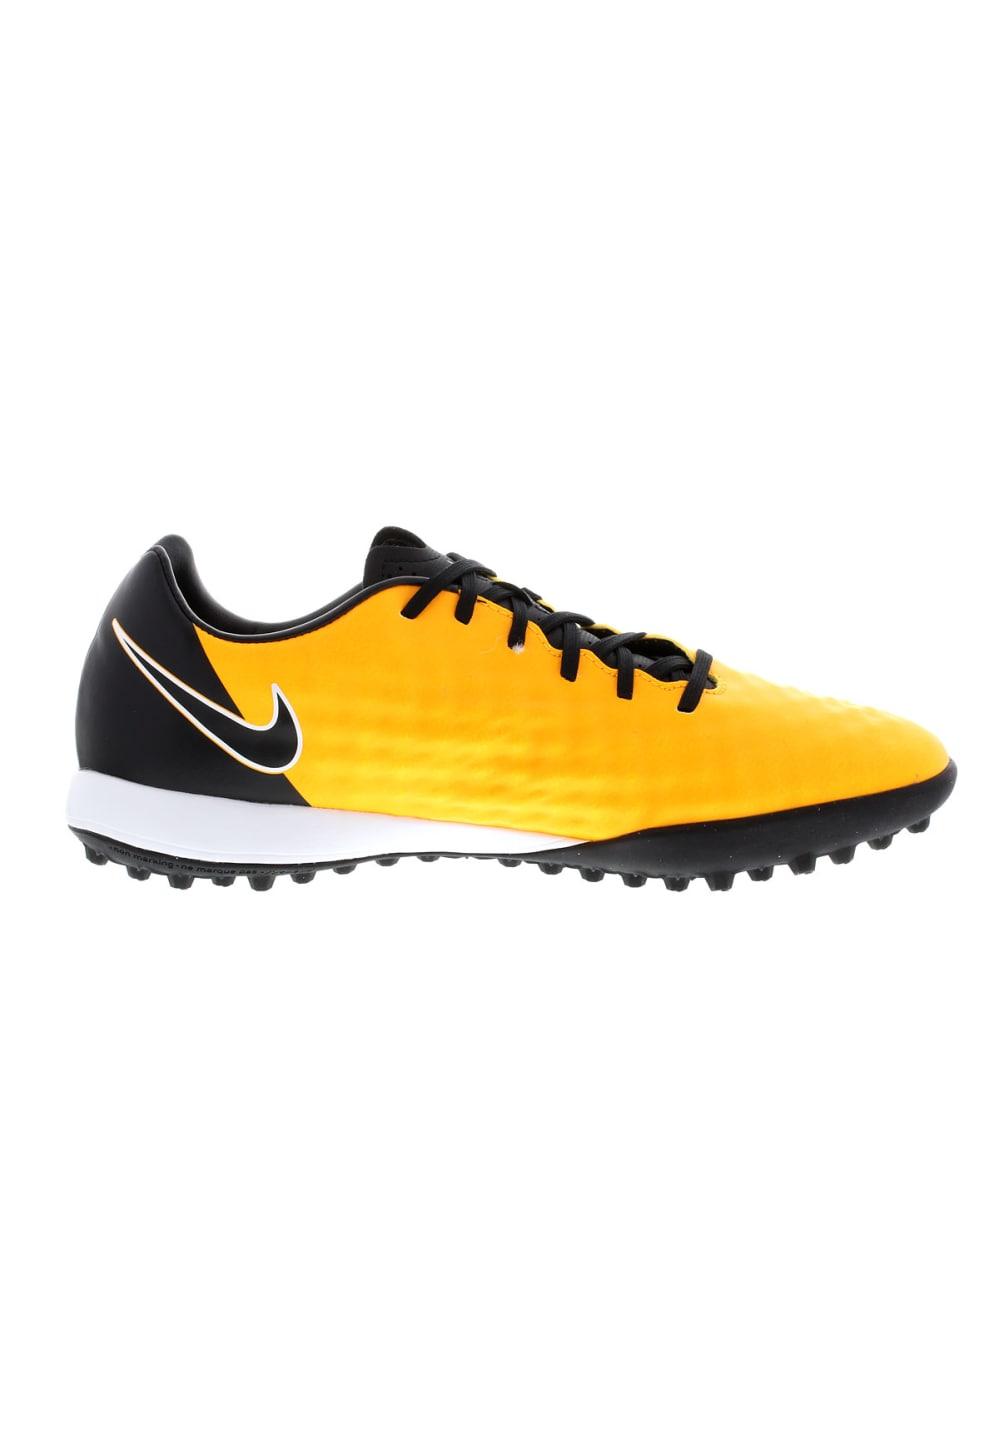 De Onda Foot Ii Pour Magistax Orange Tf Homme Chaussures Nike nwvNm08